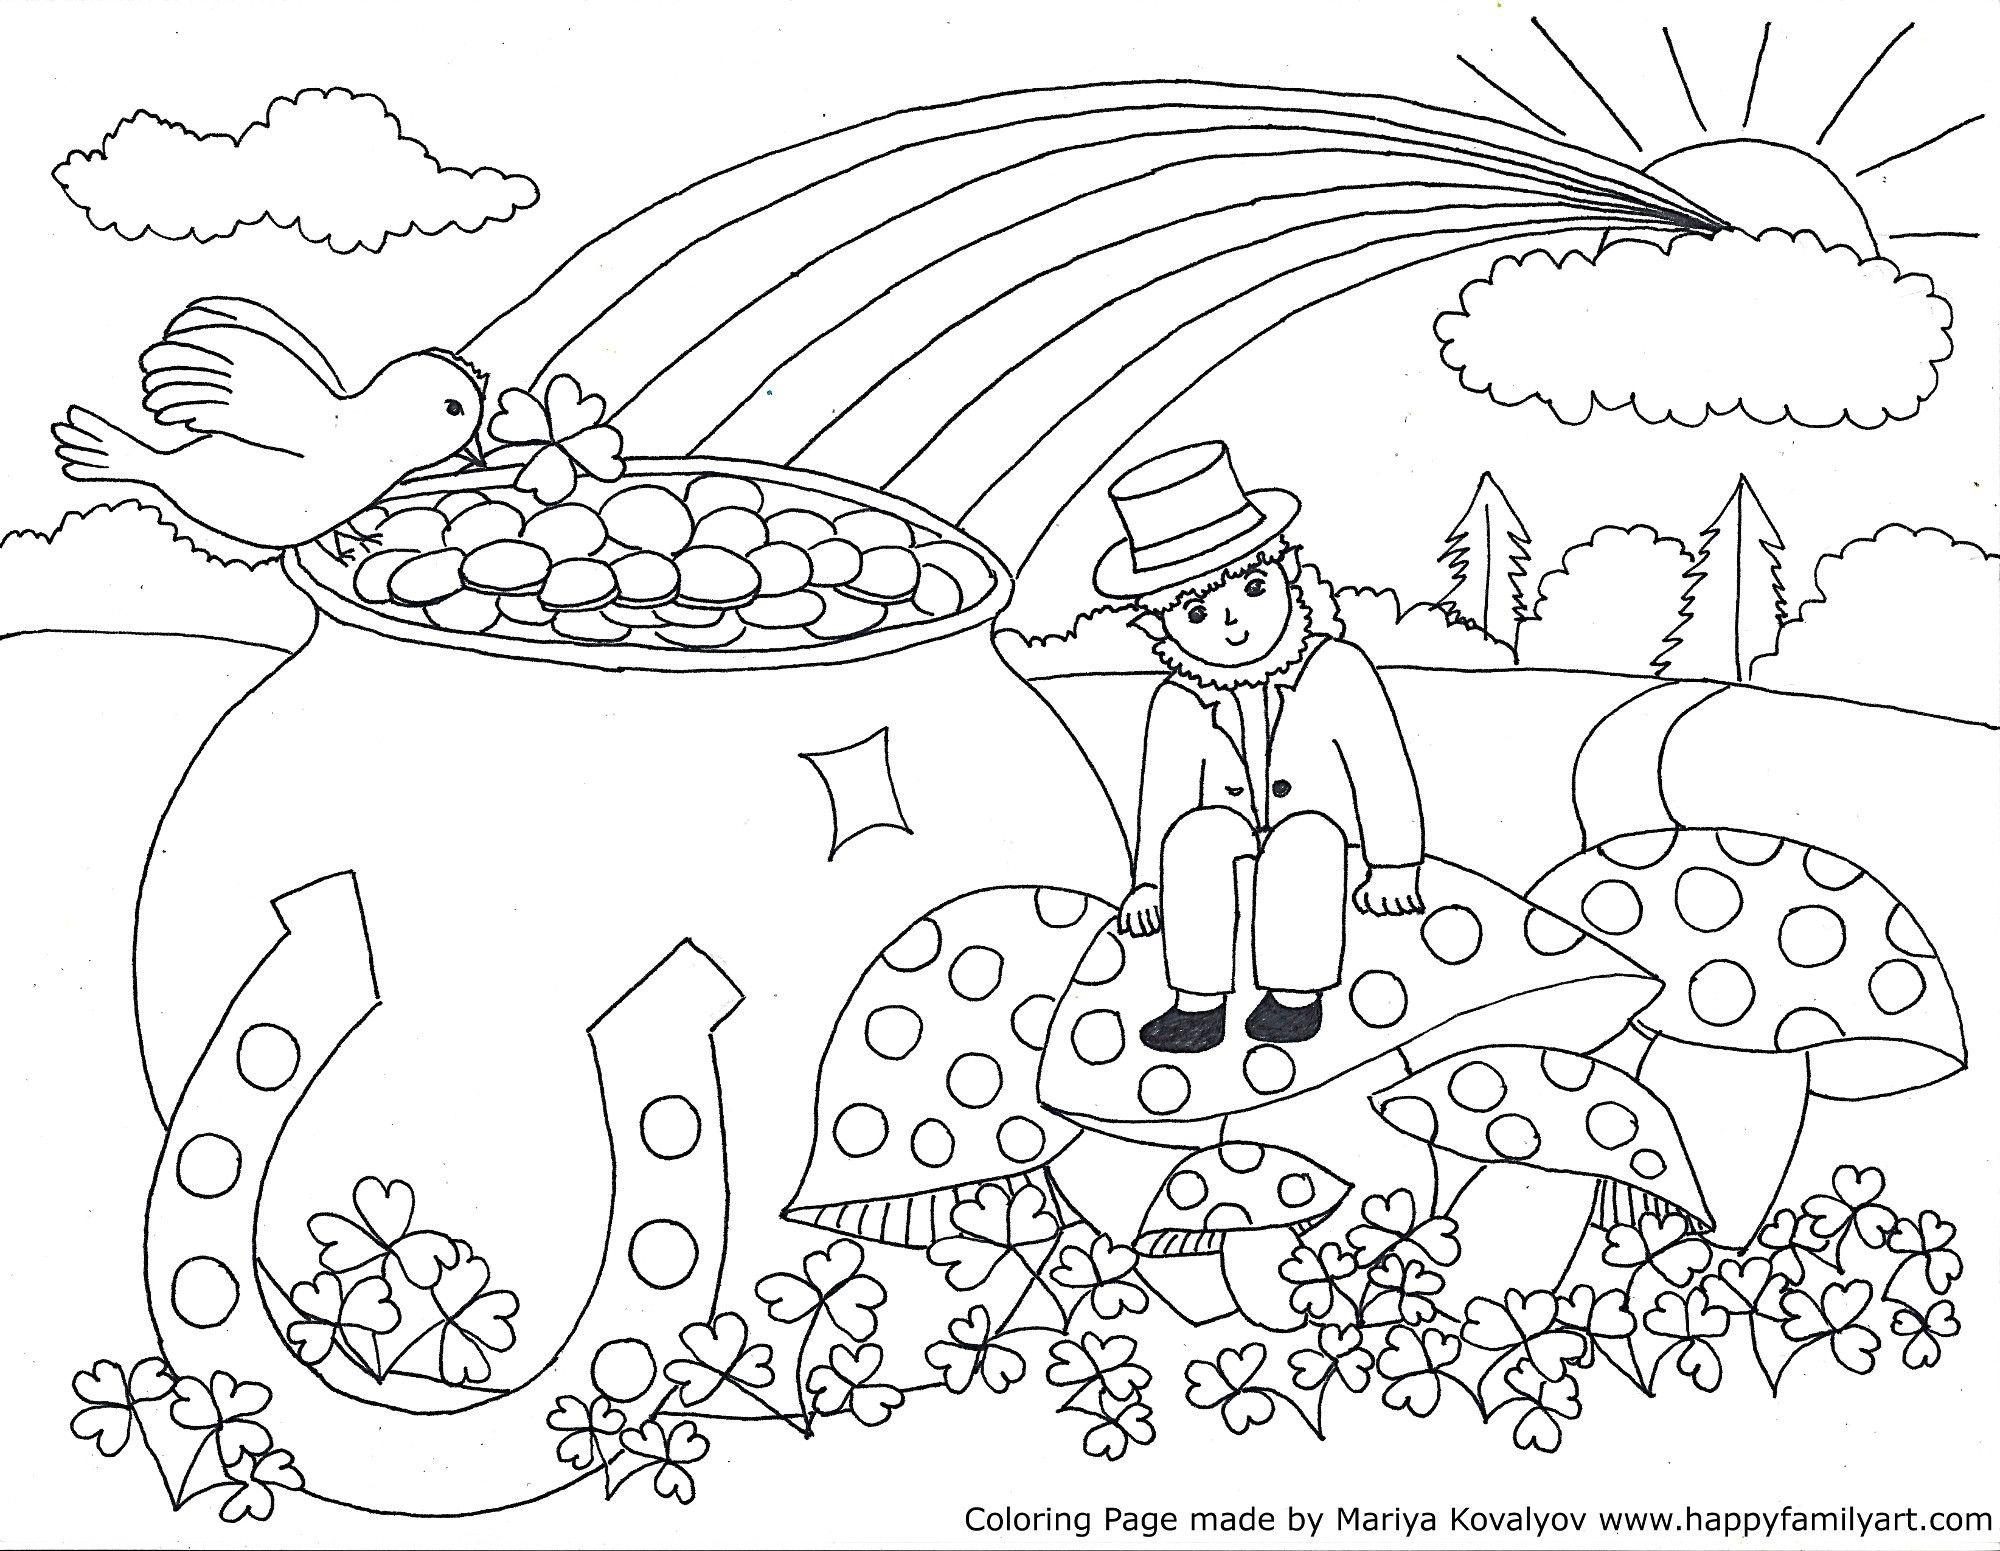 Stpatriksmedium -   Coloring Pages   Color, St Patrick, Coloring Pages - Free Printable St Patrick Day Coloring Pages